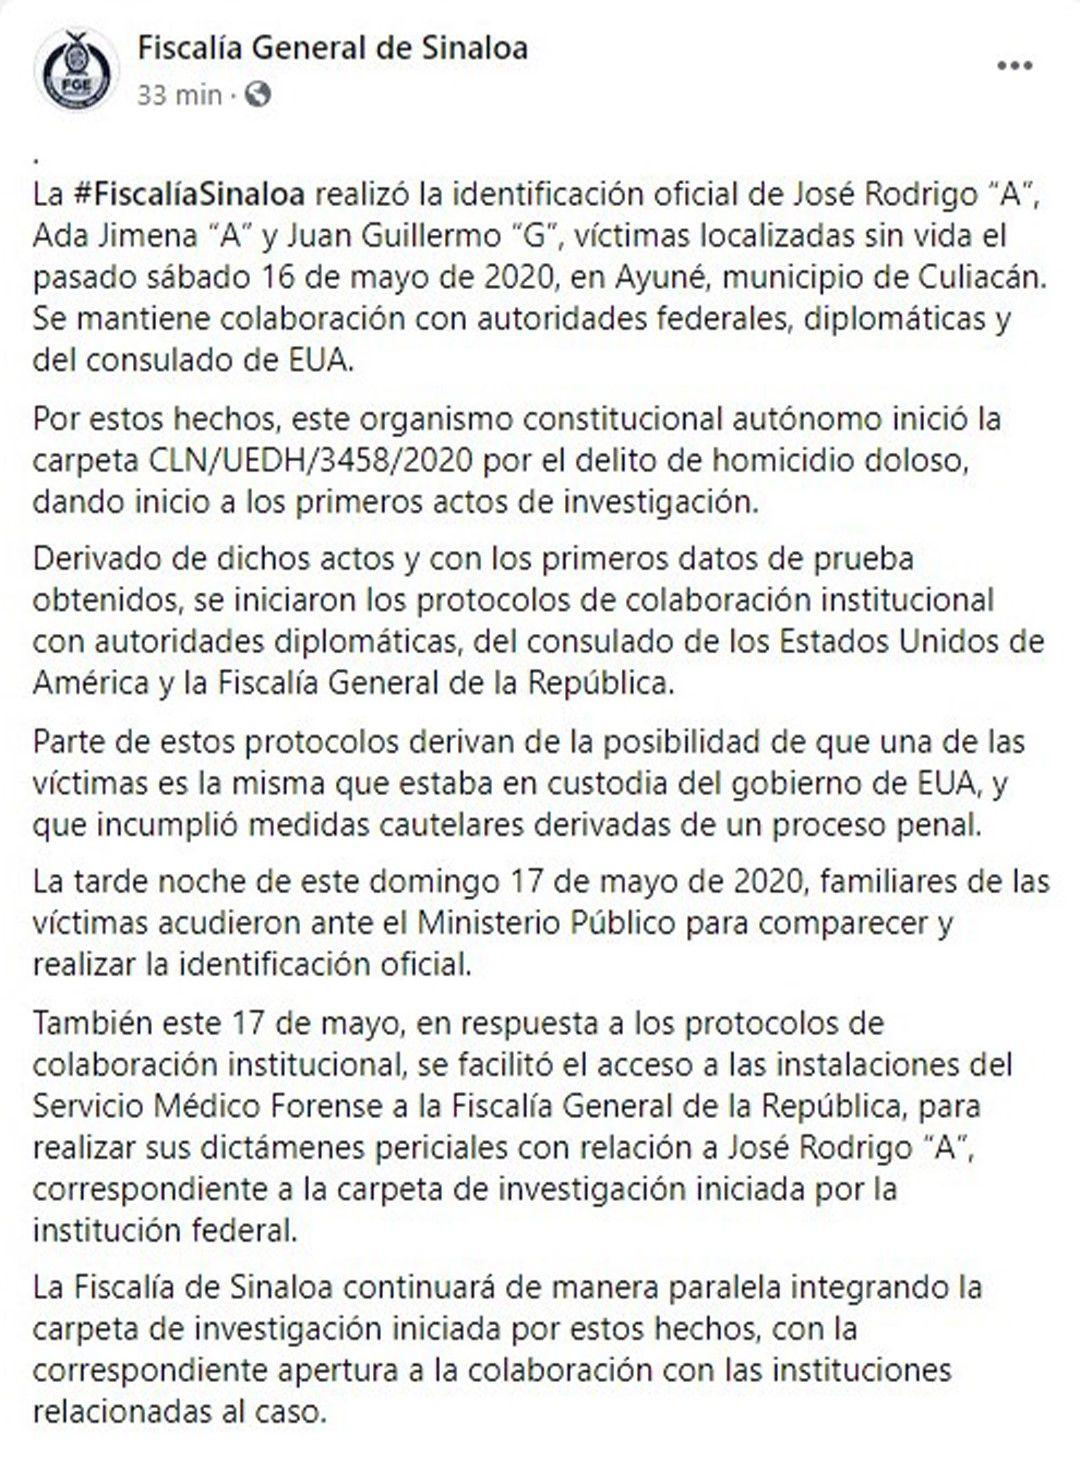 Comunicado Fiscalía General de Sinaloa (Foto: Facebook@Fiscalía General de Sinaloa)